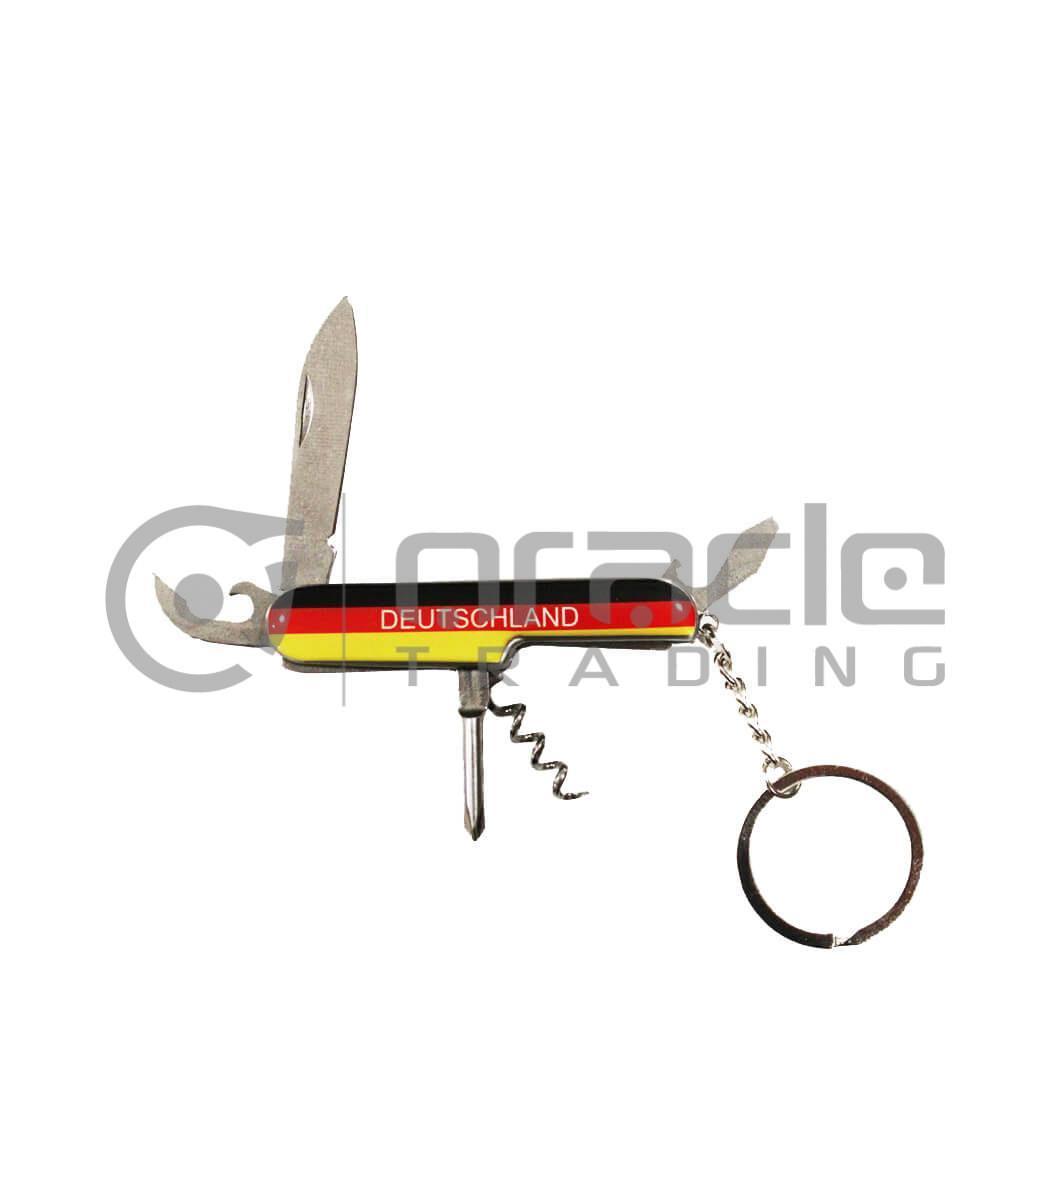 Germany Pocket Knife Keychain 12-Pack